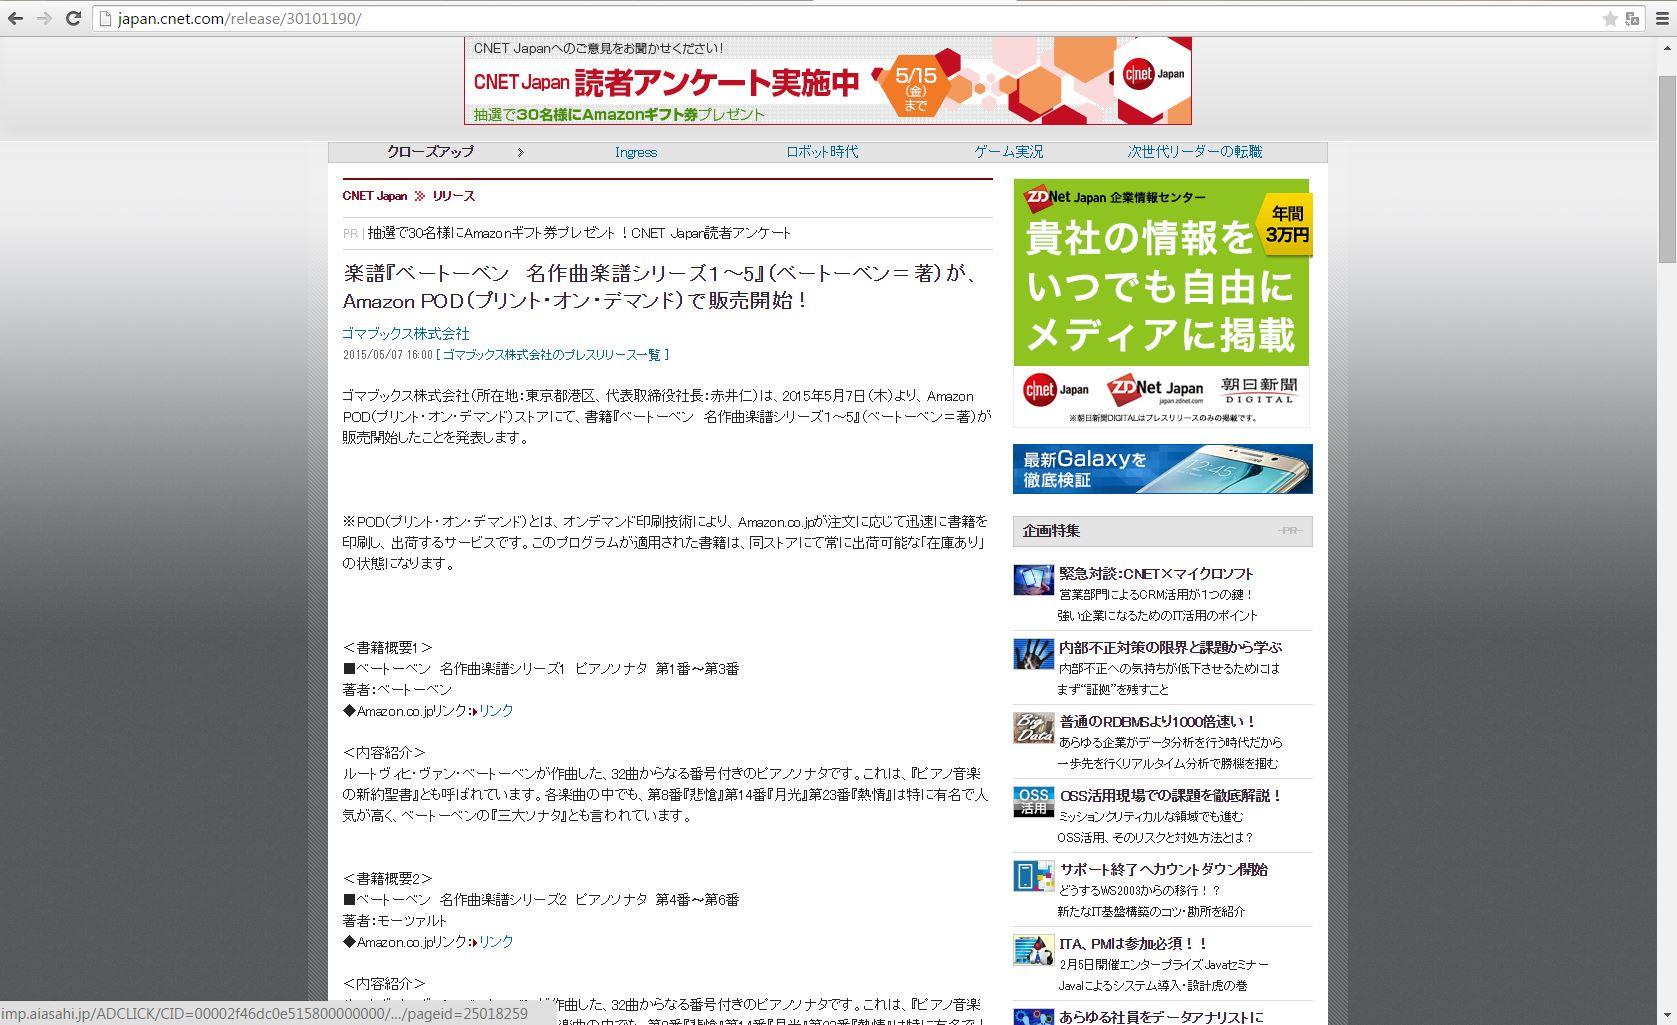 cnet.co.jp